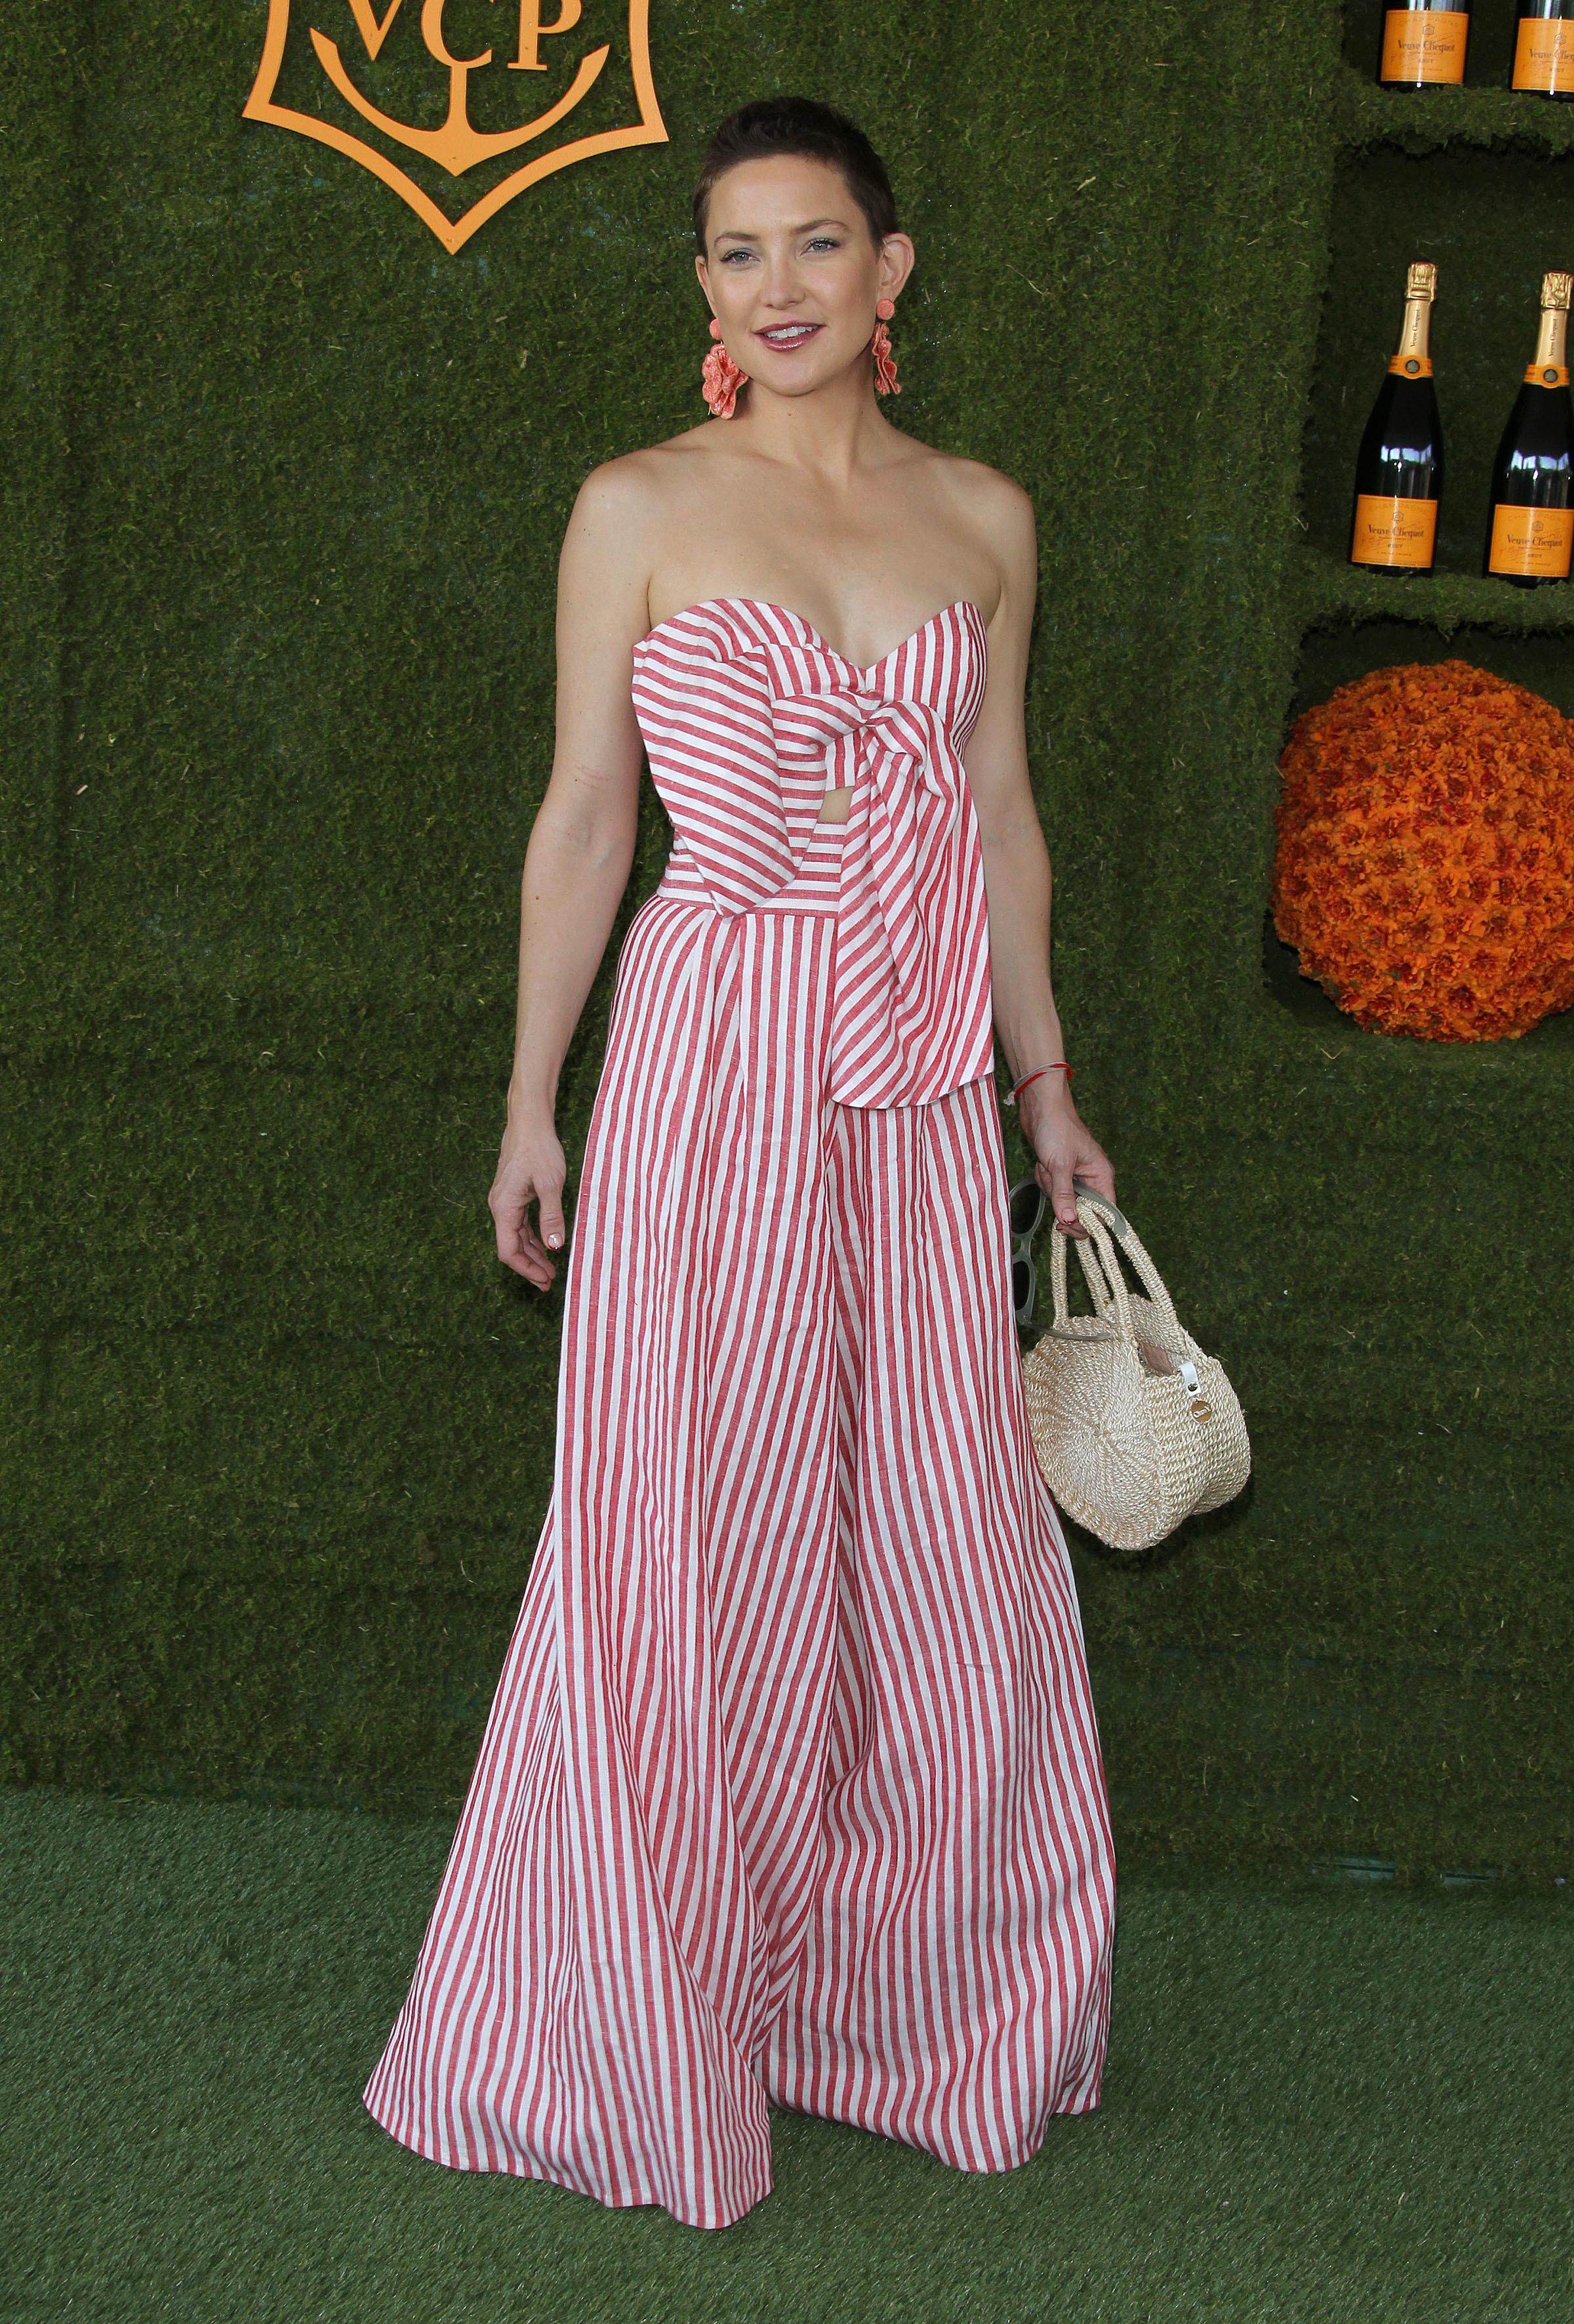 Kate Hudson gets candid about Brad Pitt romance rumors